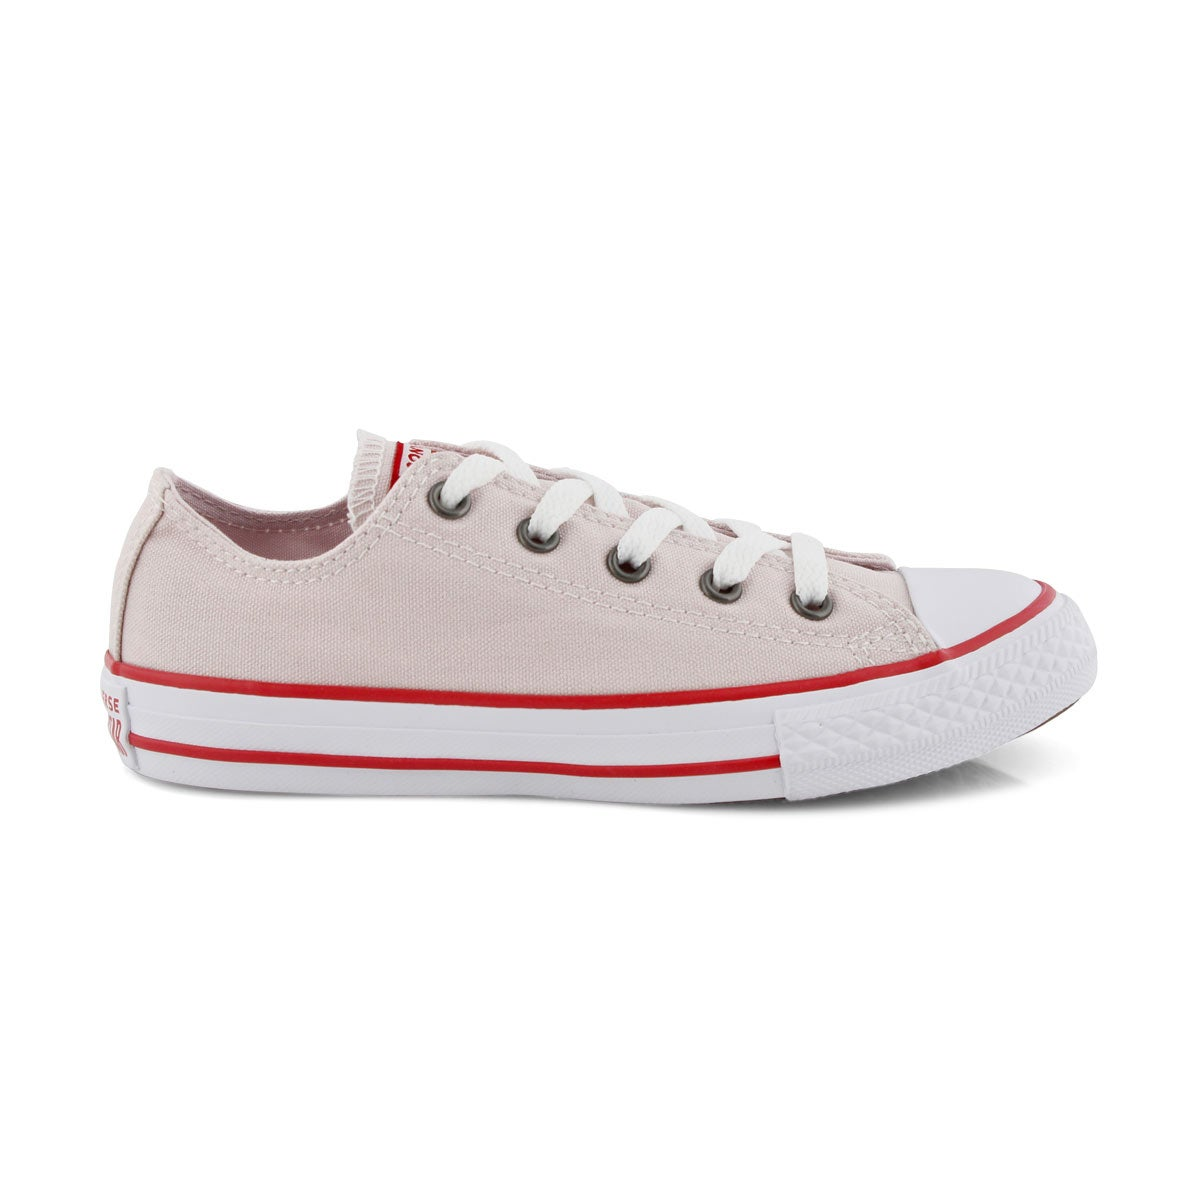 Girls' CT ALL STAR SEASONAL rose/red/wht sneakers